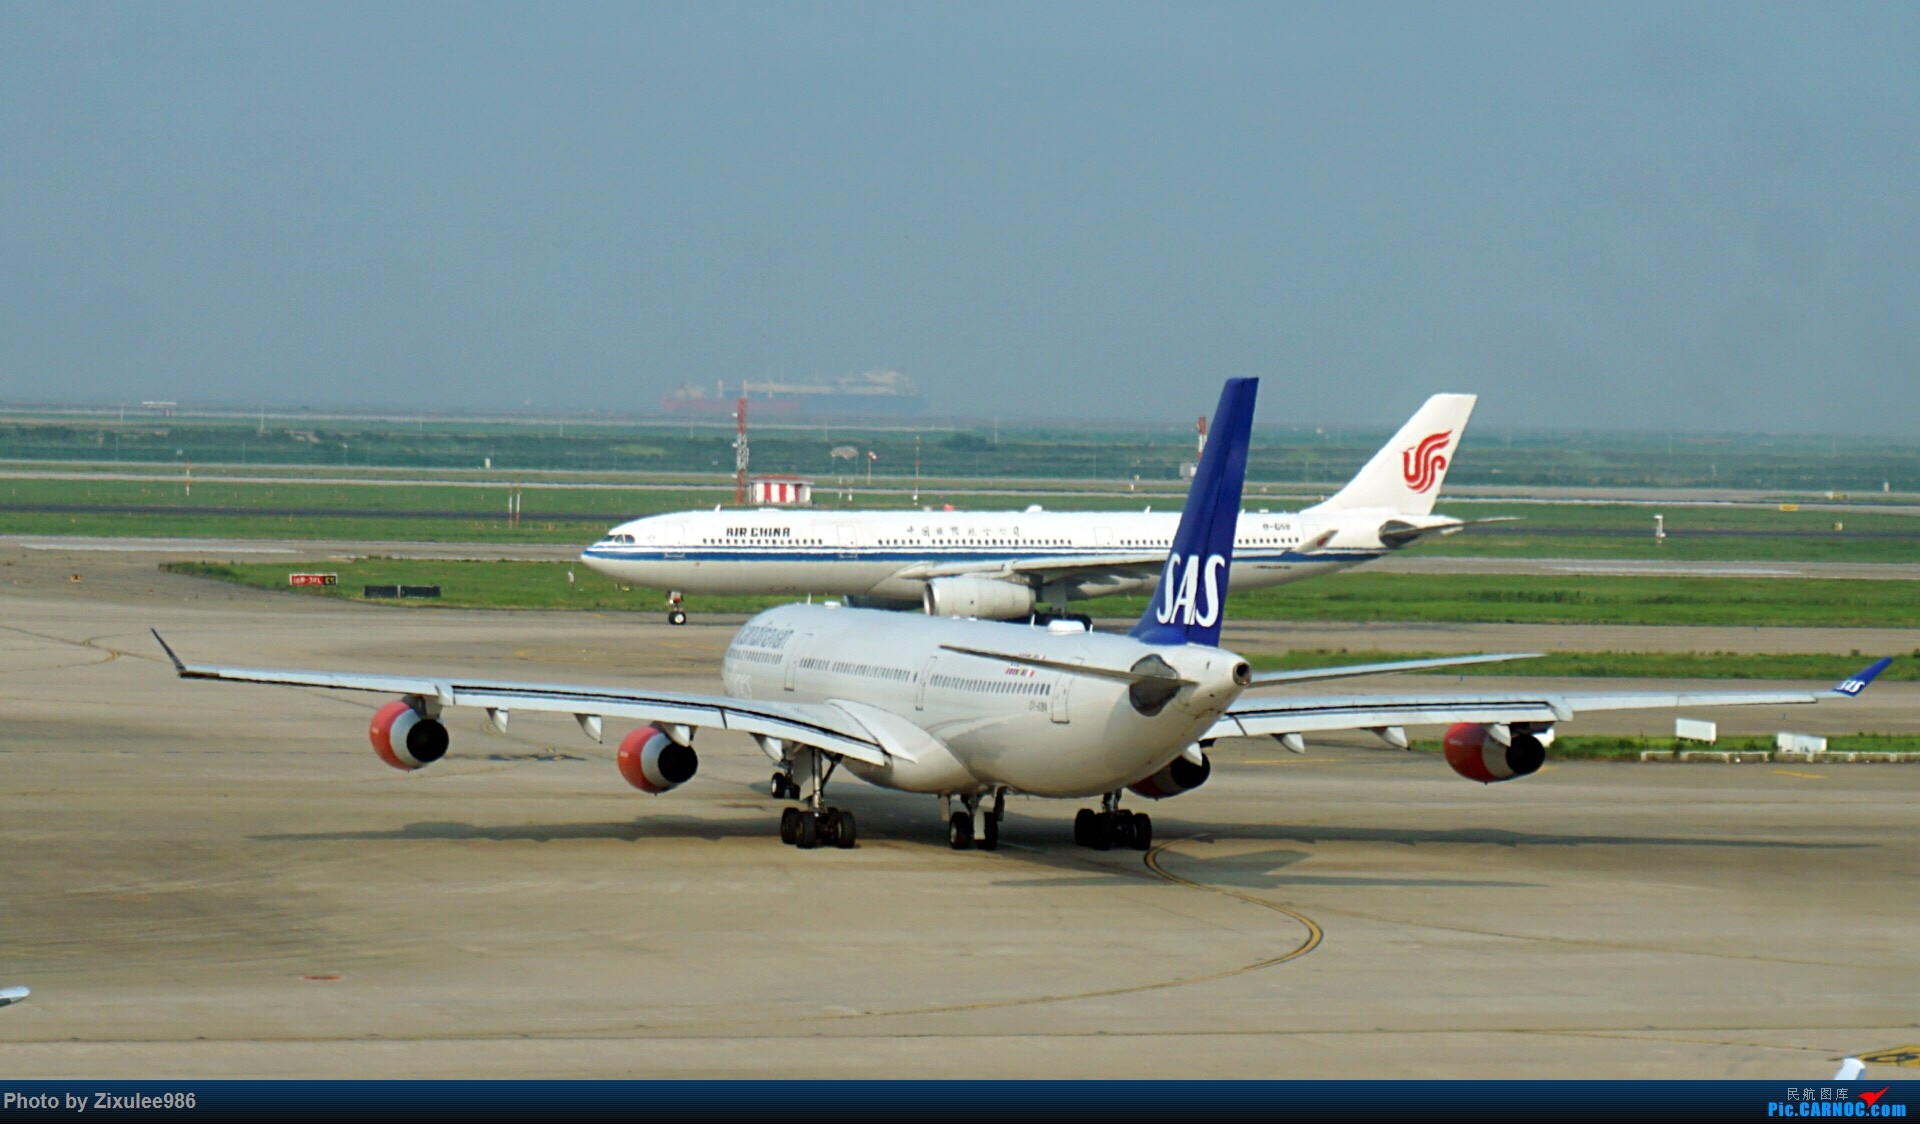 Re:[原创]加拿大21日游学之旅(一)~JJN-PVG-YYZ..(内含flightlog)~第一次发游记~多图缓更请谅解 AIRBUS A340-313X OY-KBA 中国上海浦东国际机场